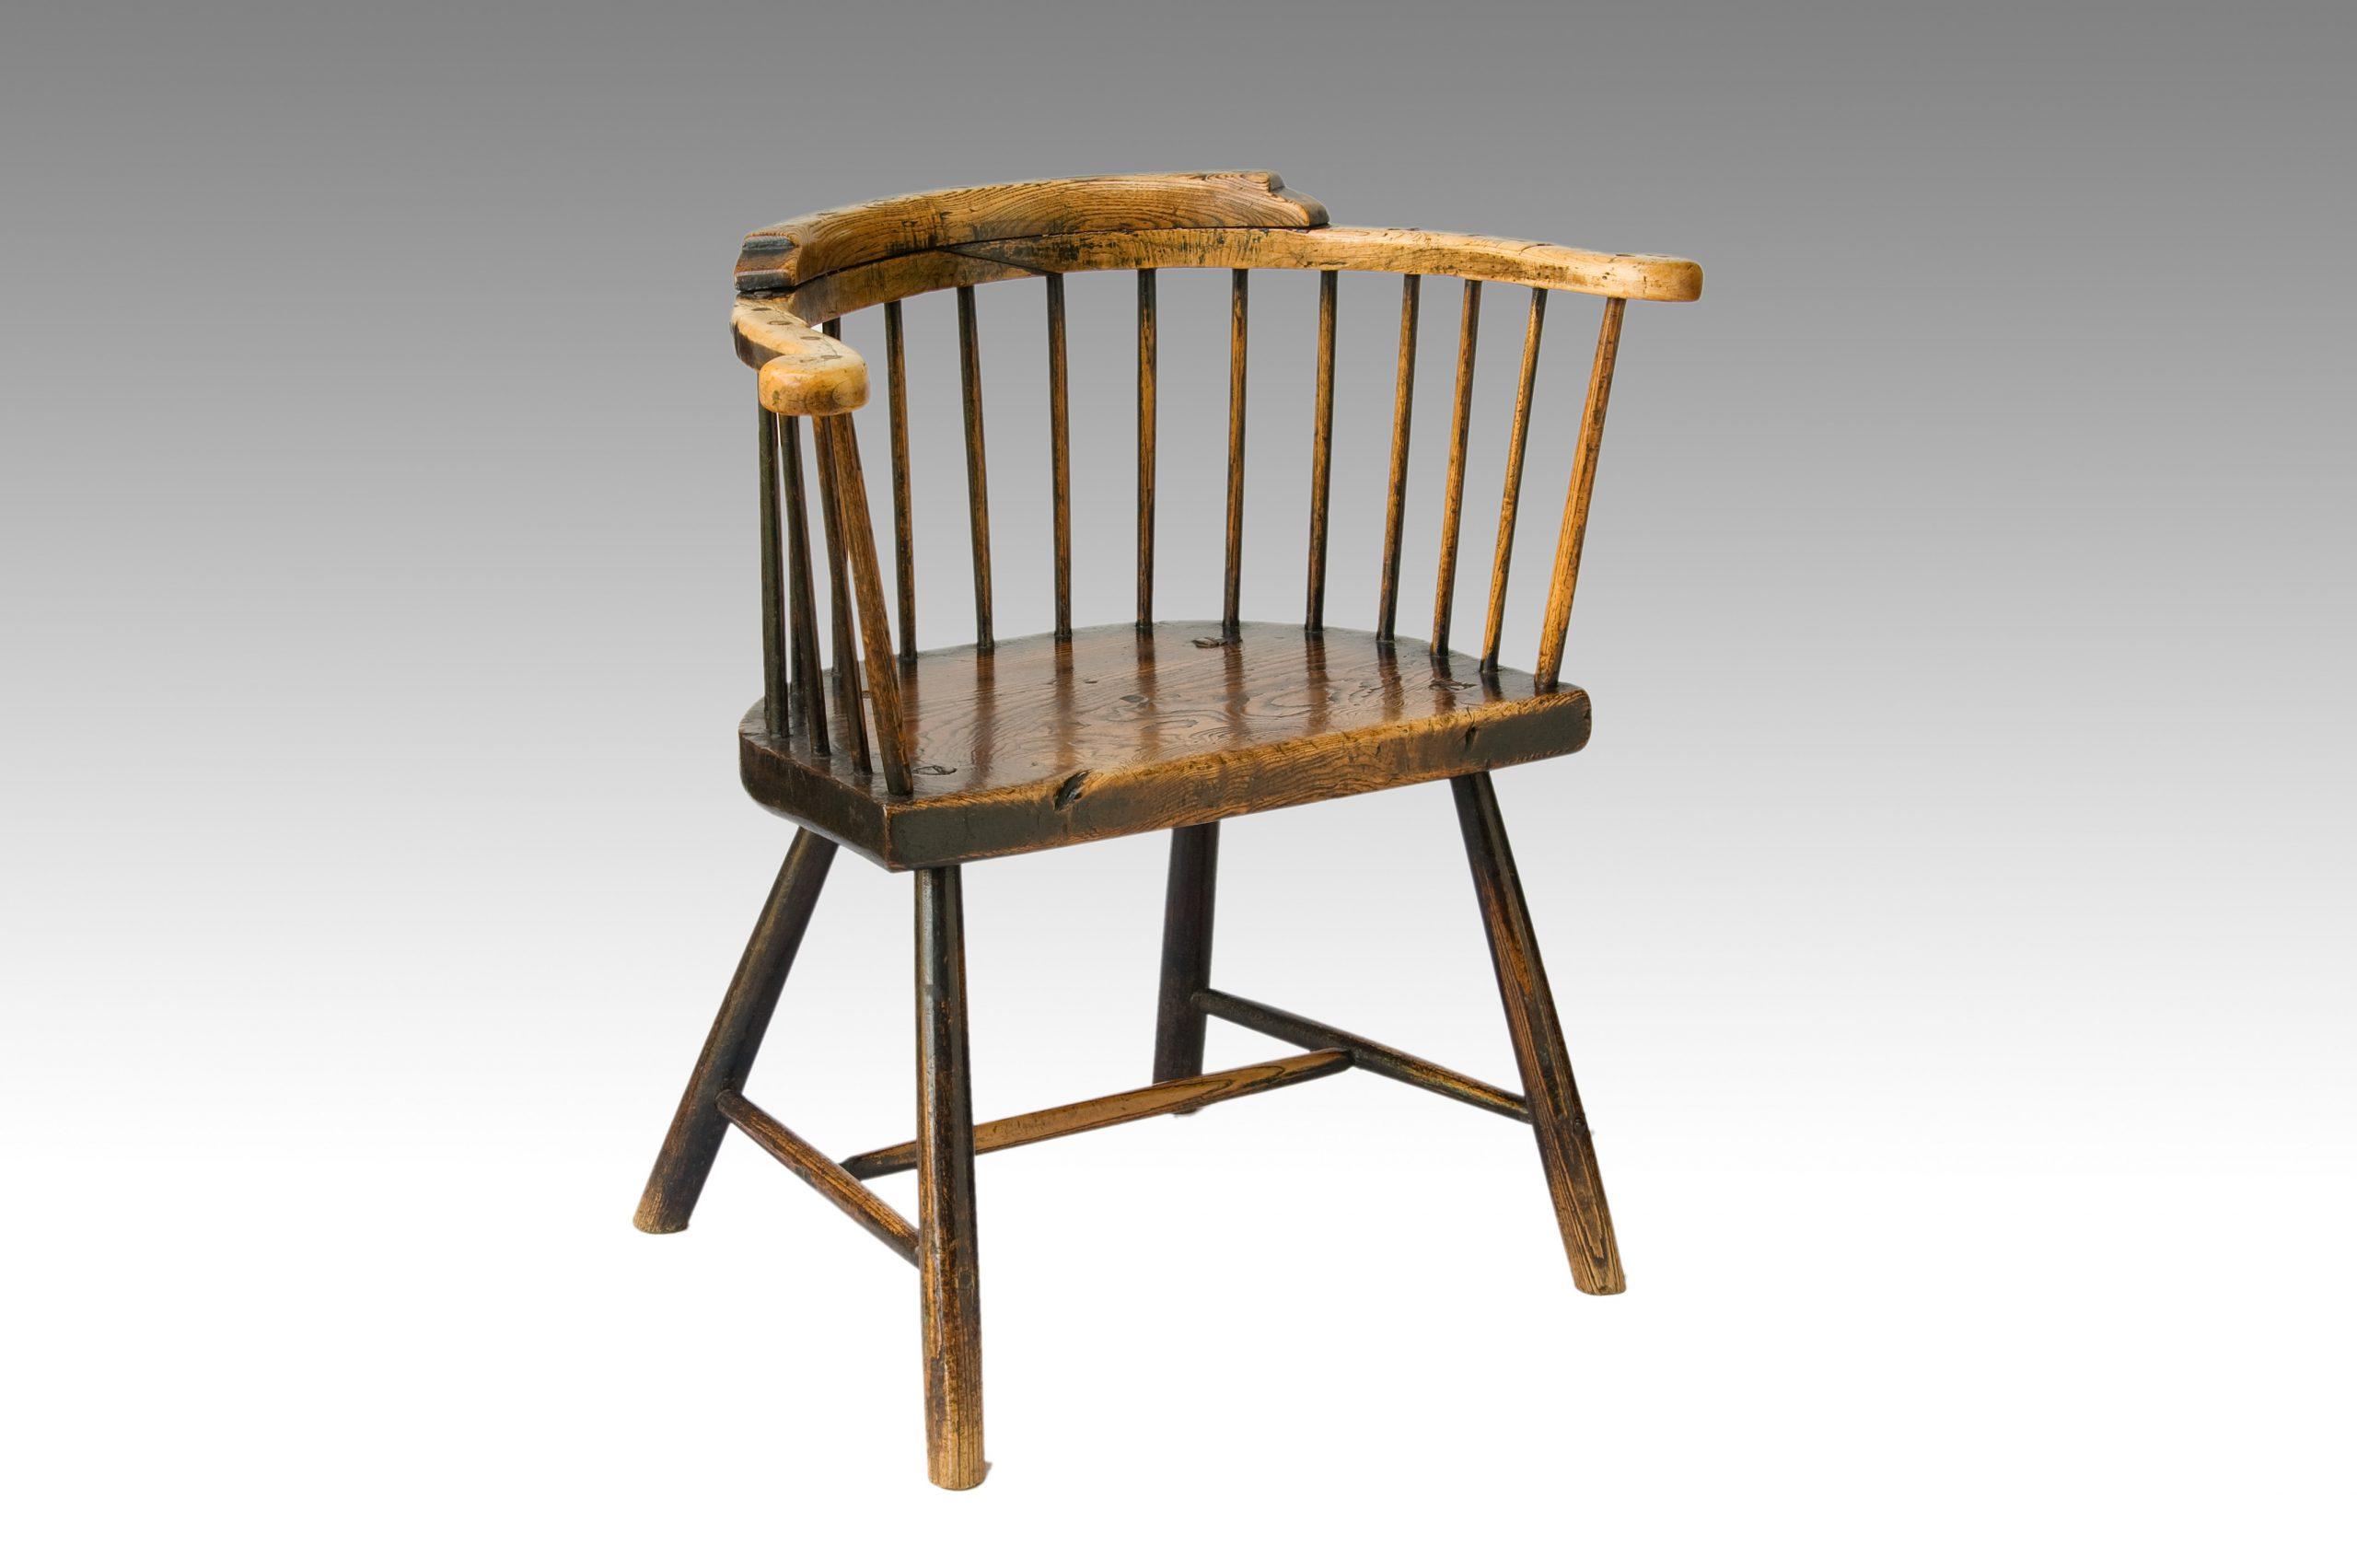 Image of Primitive Low-back Windsor Armchair